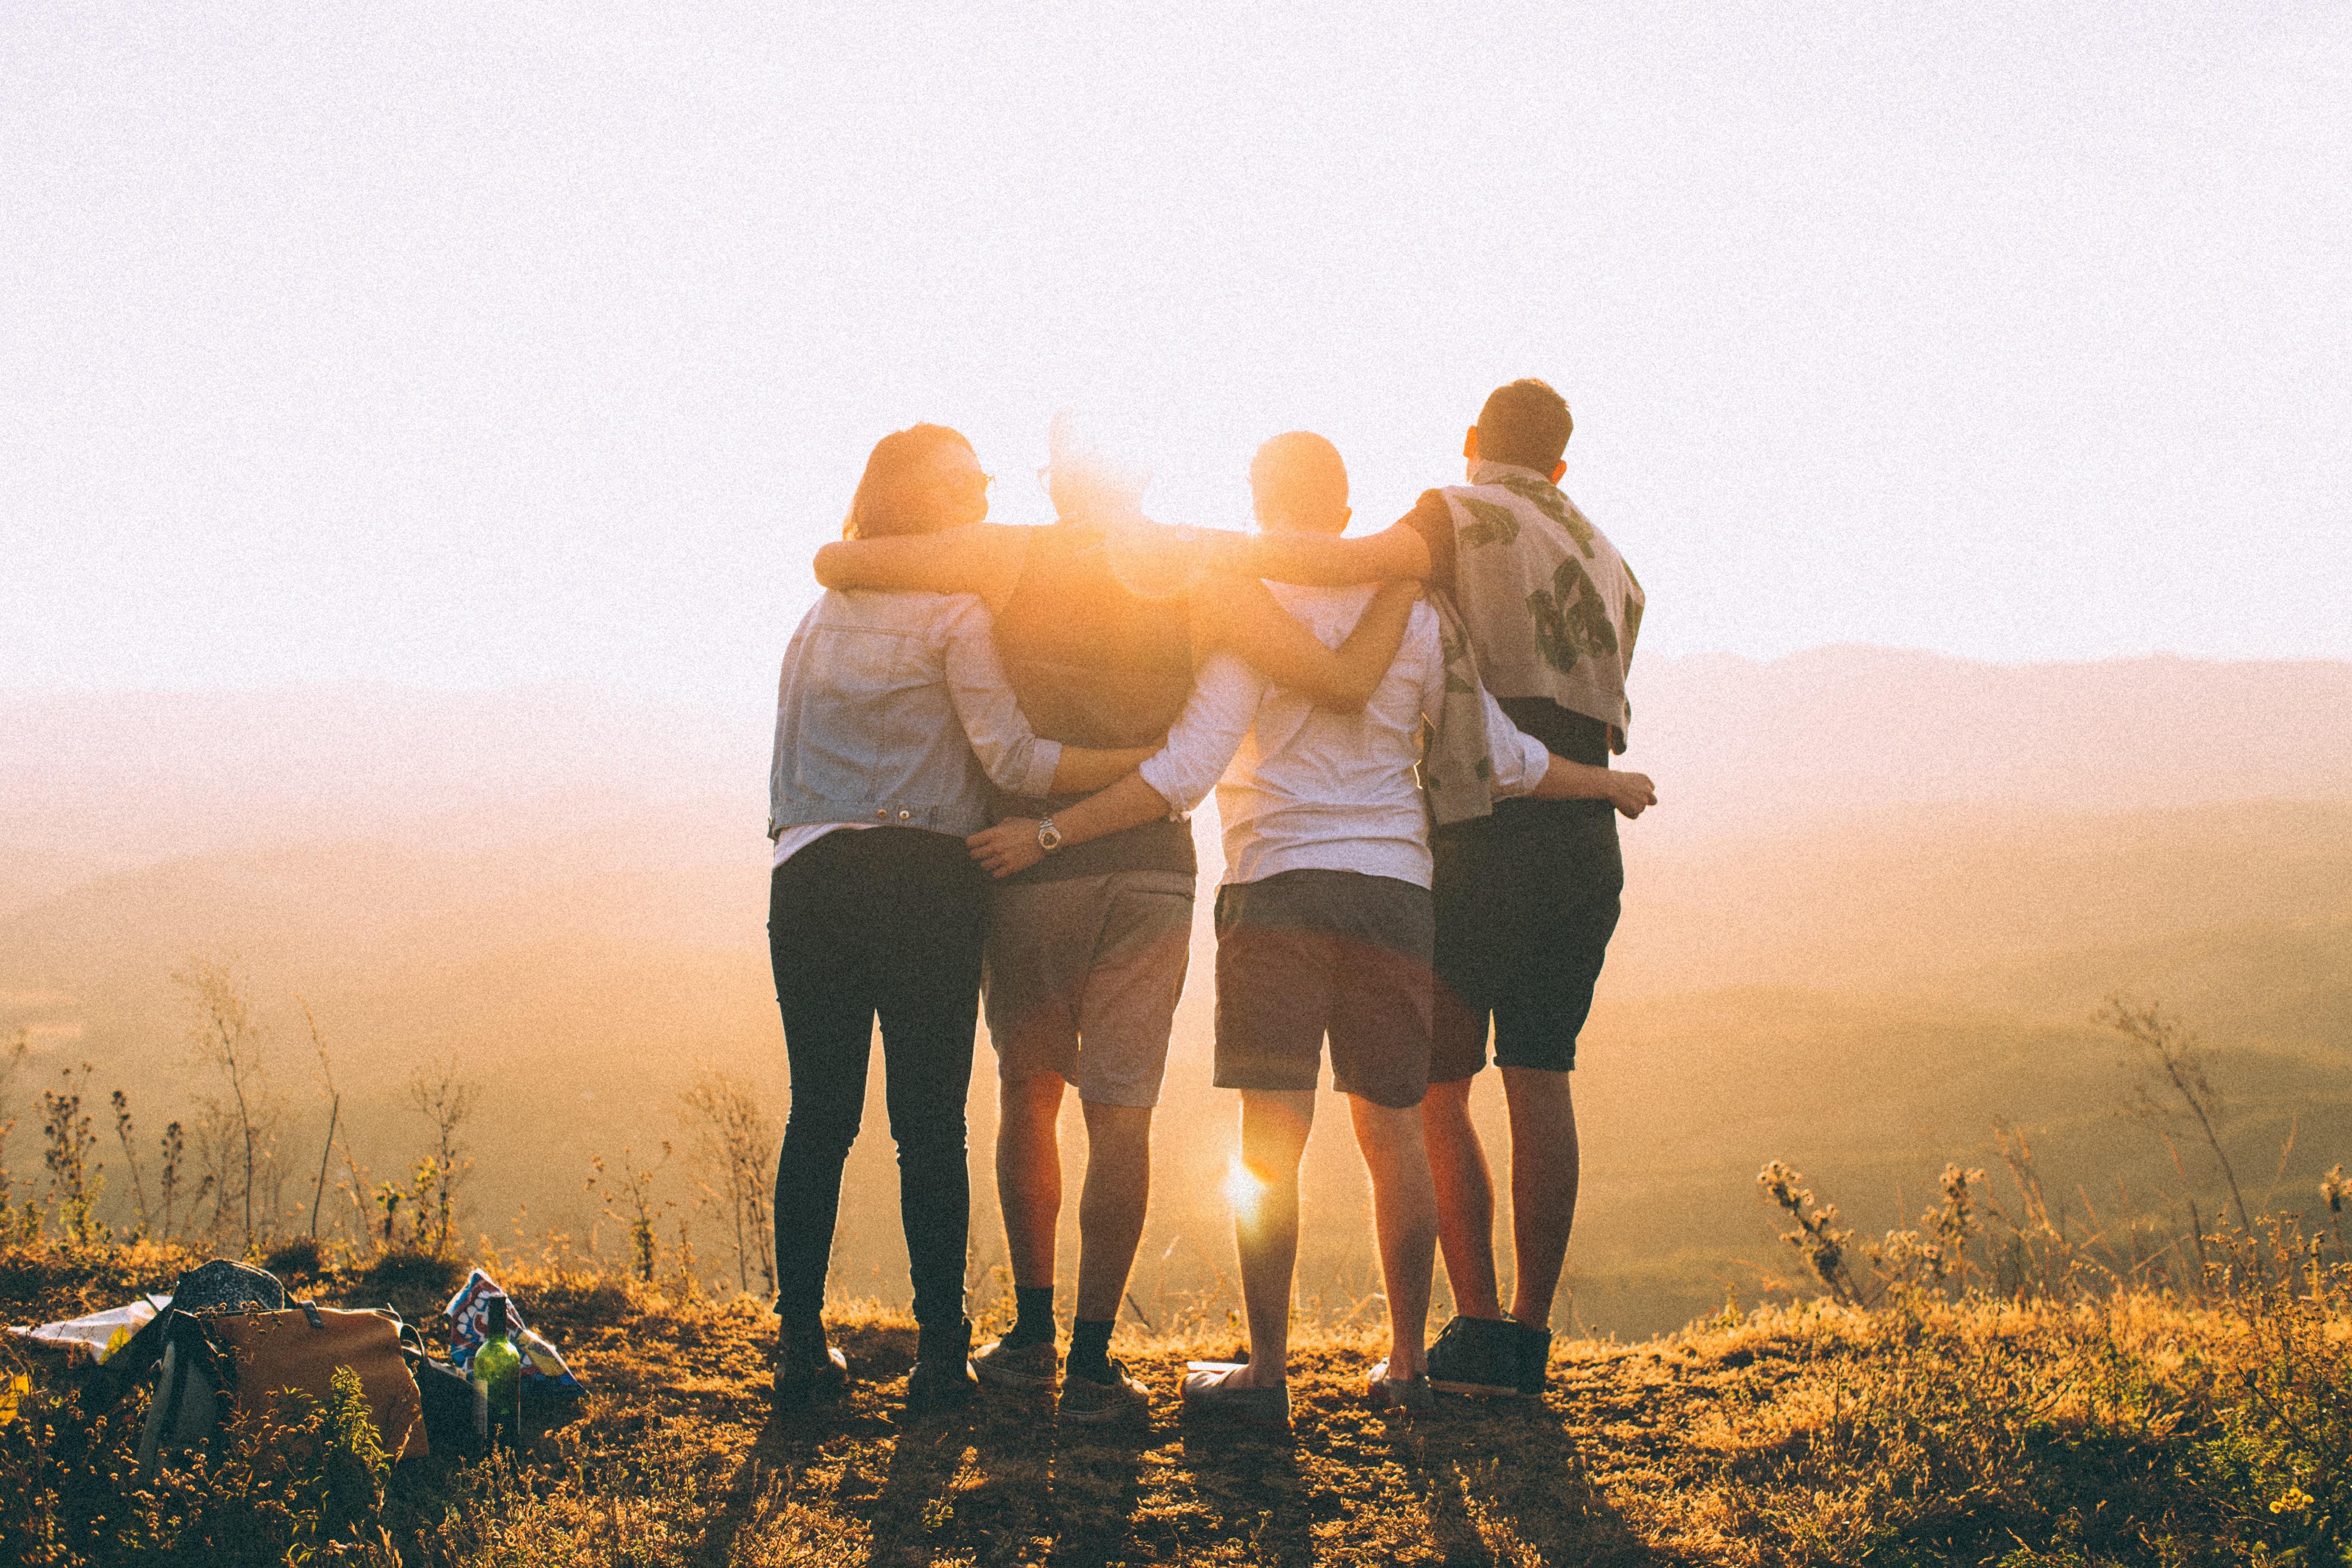 groupe câlin solidarité amitié amour